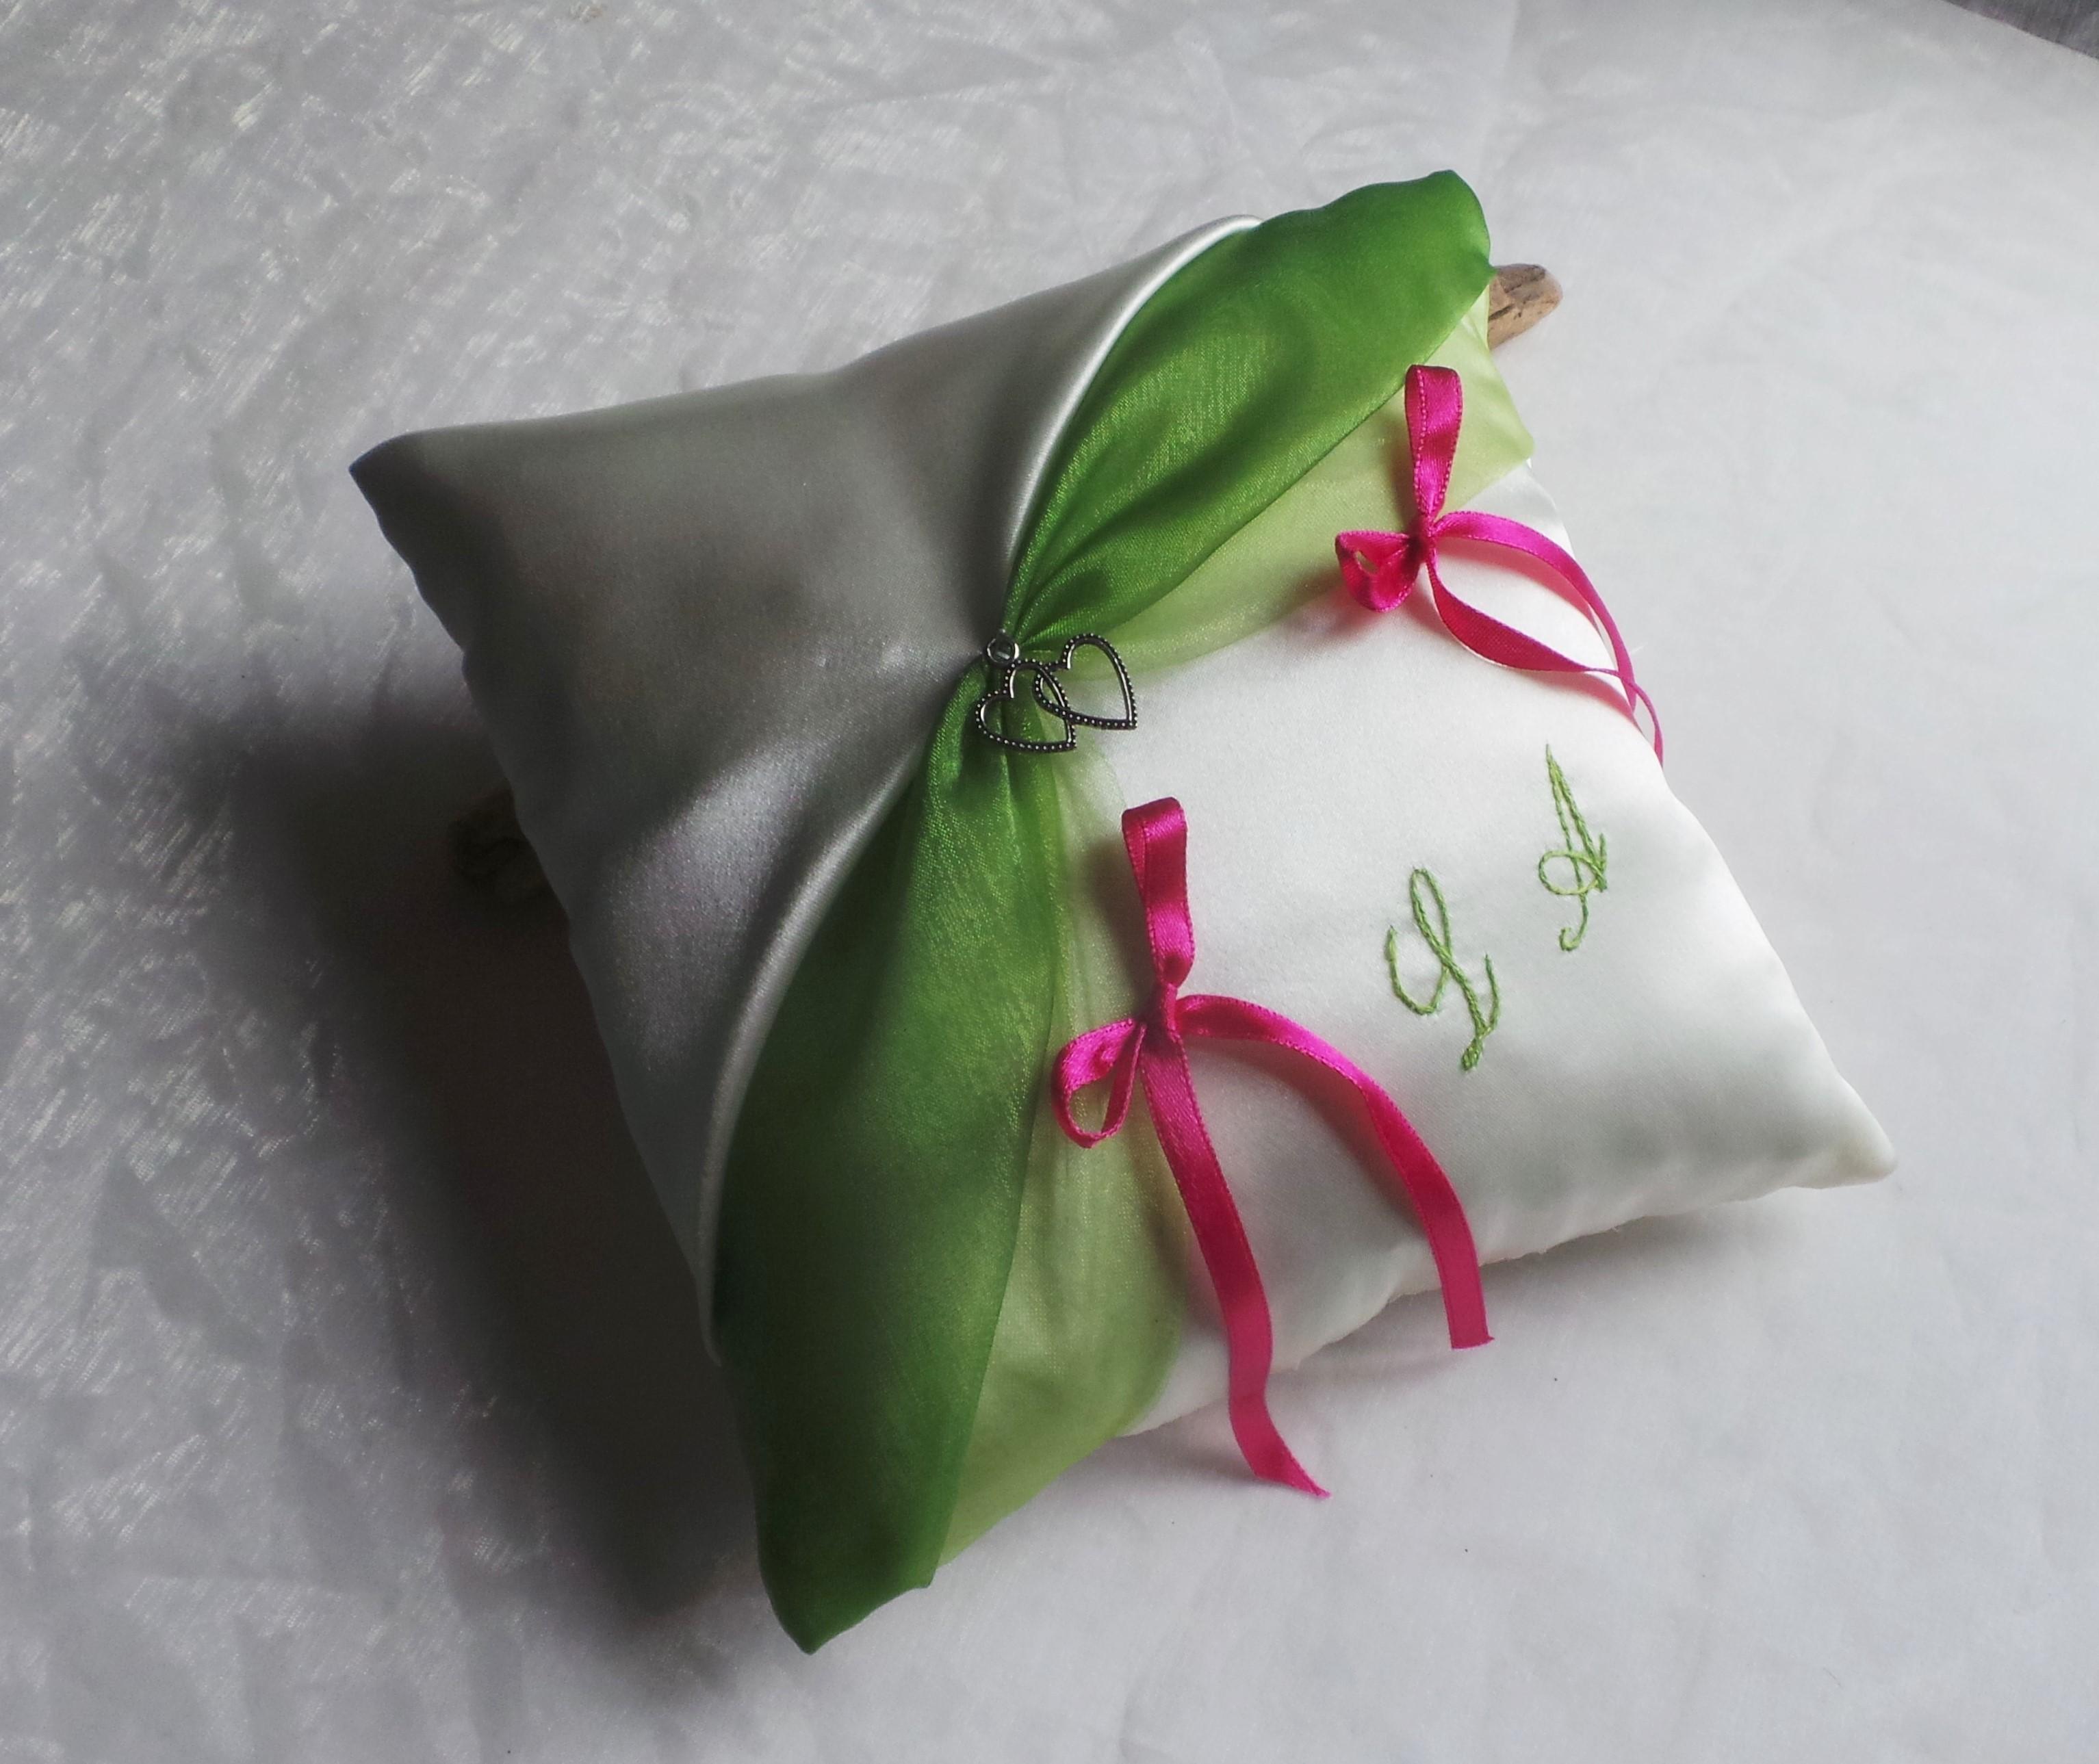 Coussin alliance personnalise vert anis ivoire rose fuchsia